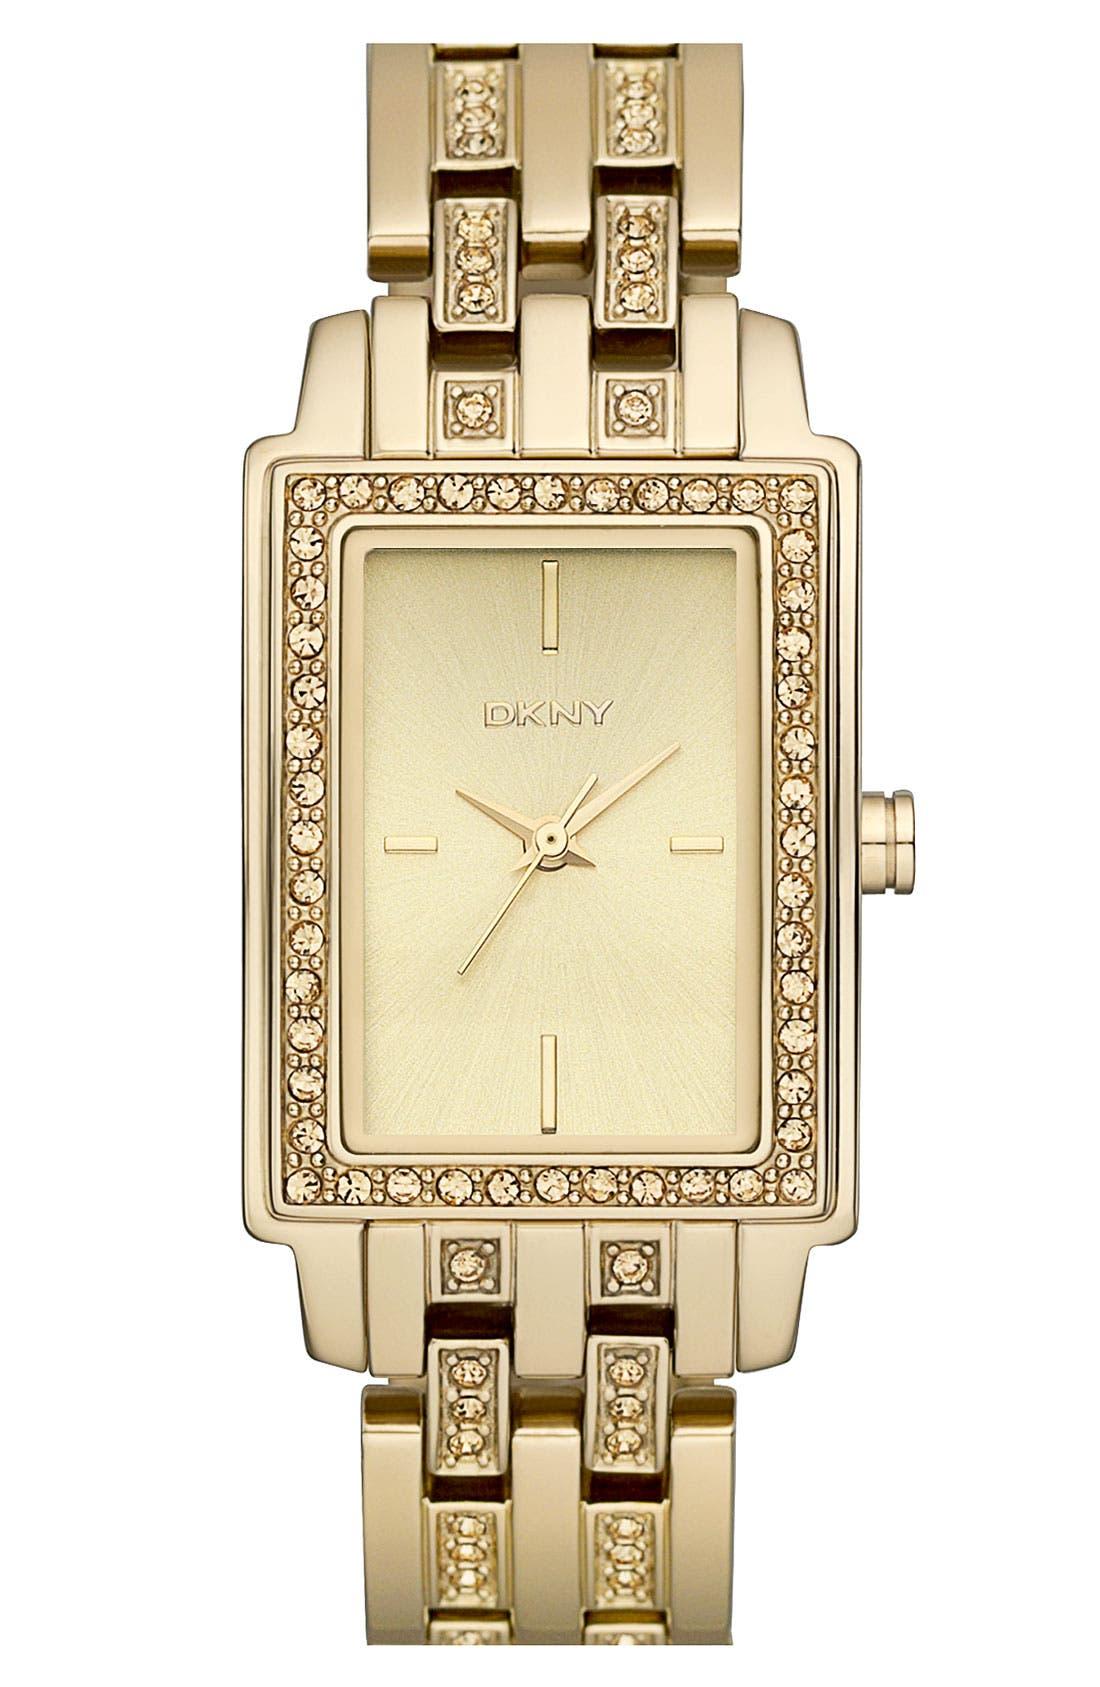 Main Image - DKNY Crystal Detail Rectangular Bracelet Watch, 23mm x 28mm